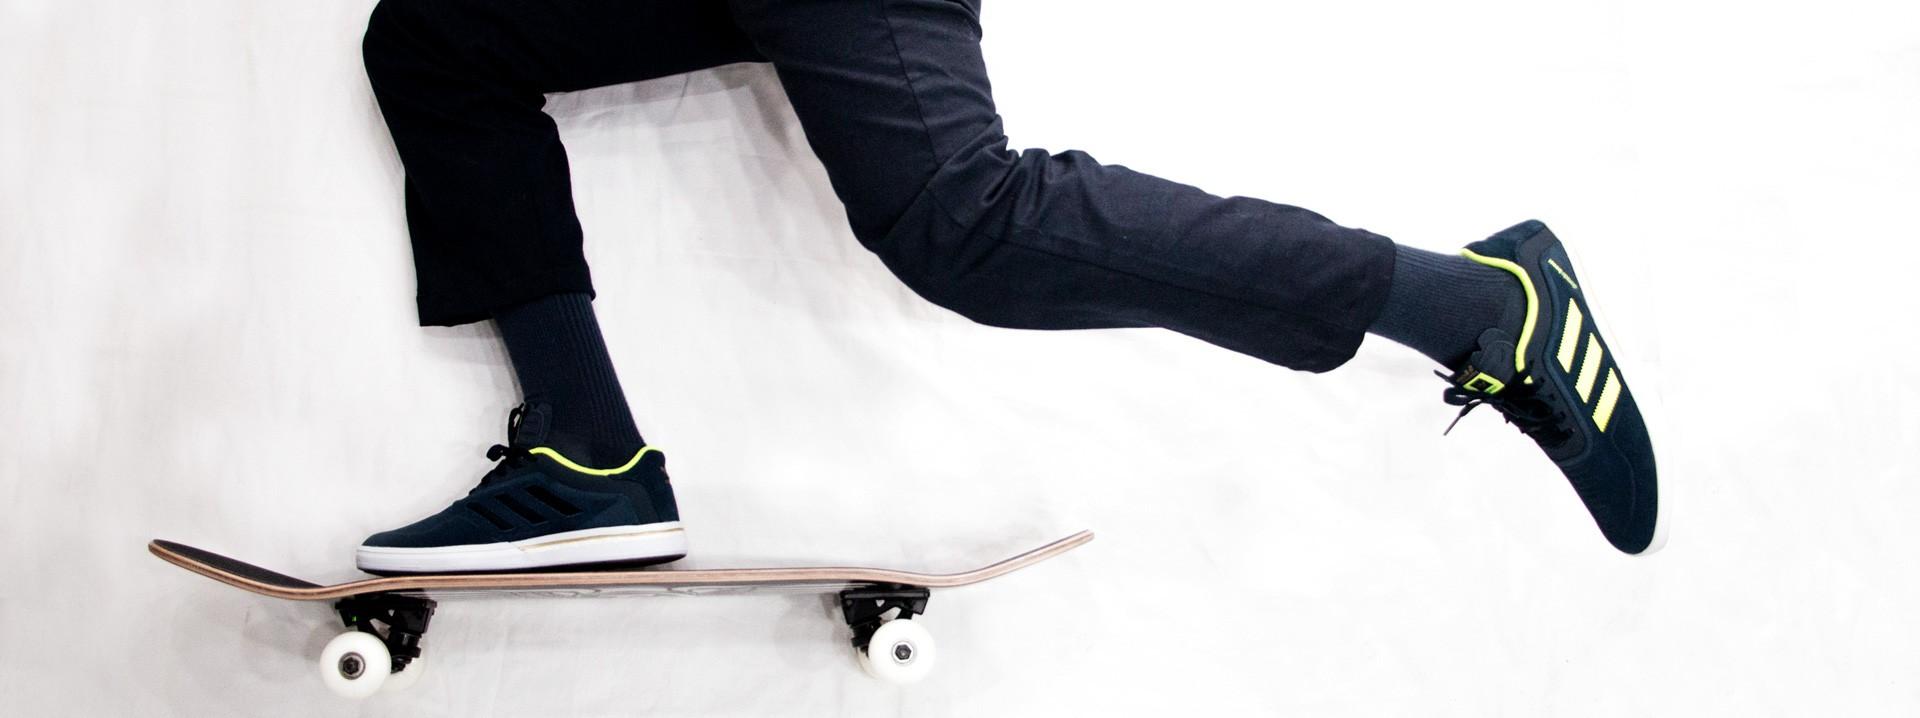 Los mejores tenis para skateboarding en Frontside Skate Shop